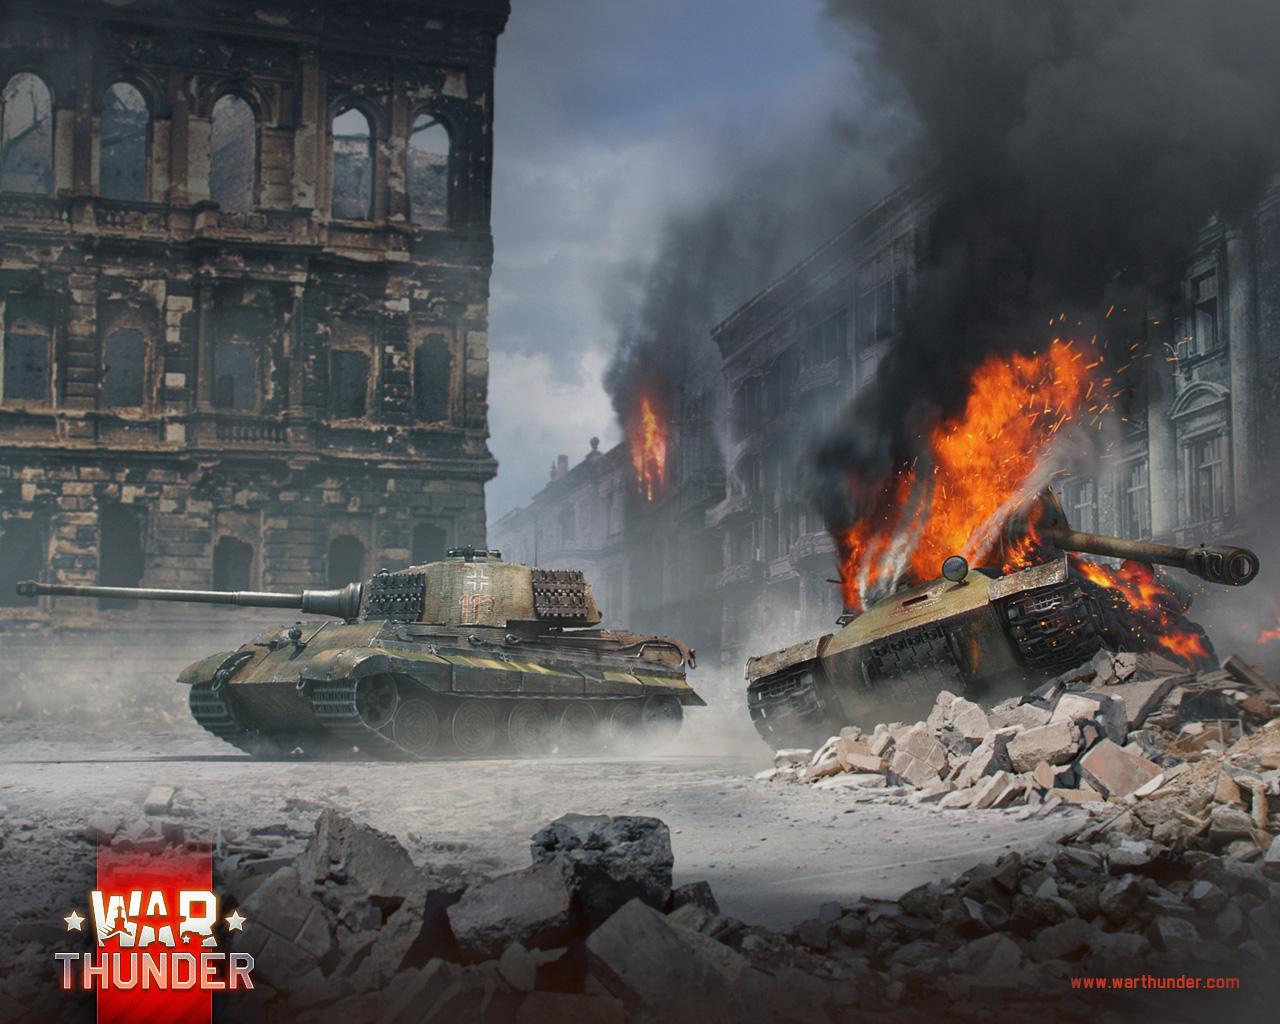 [Special] Tank Duels: Tiger II vs IS-2 - News - War Thunder